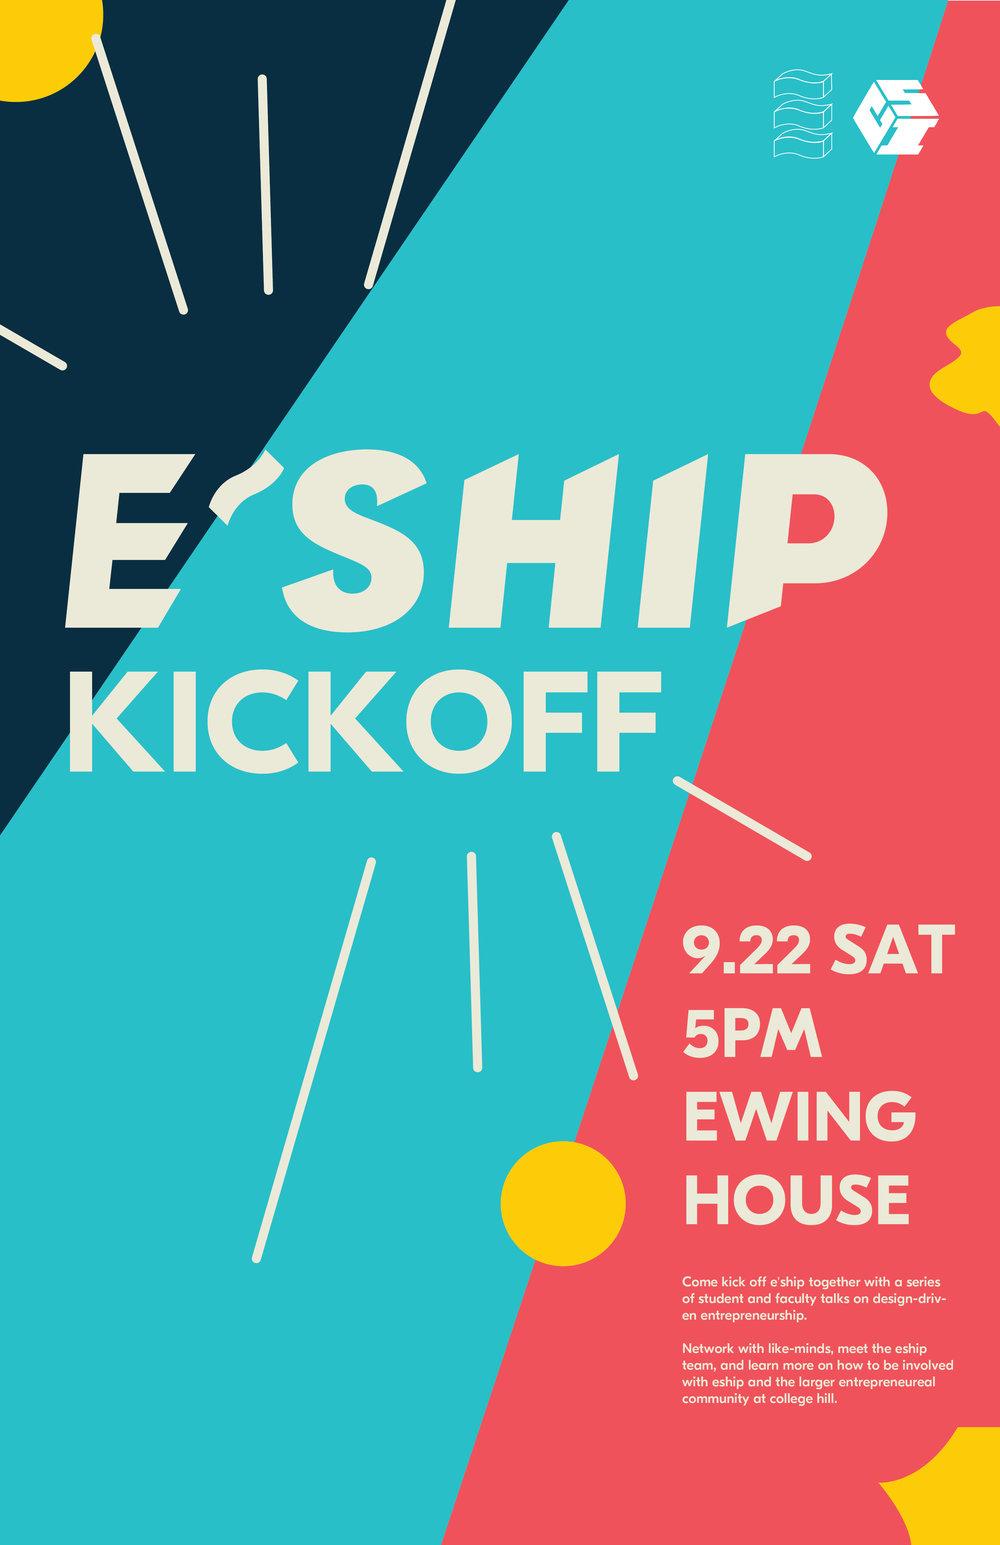 09/22 : E'SHIP Kickoff